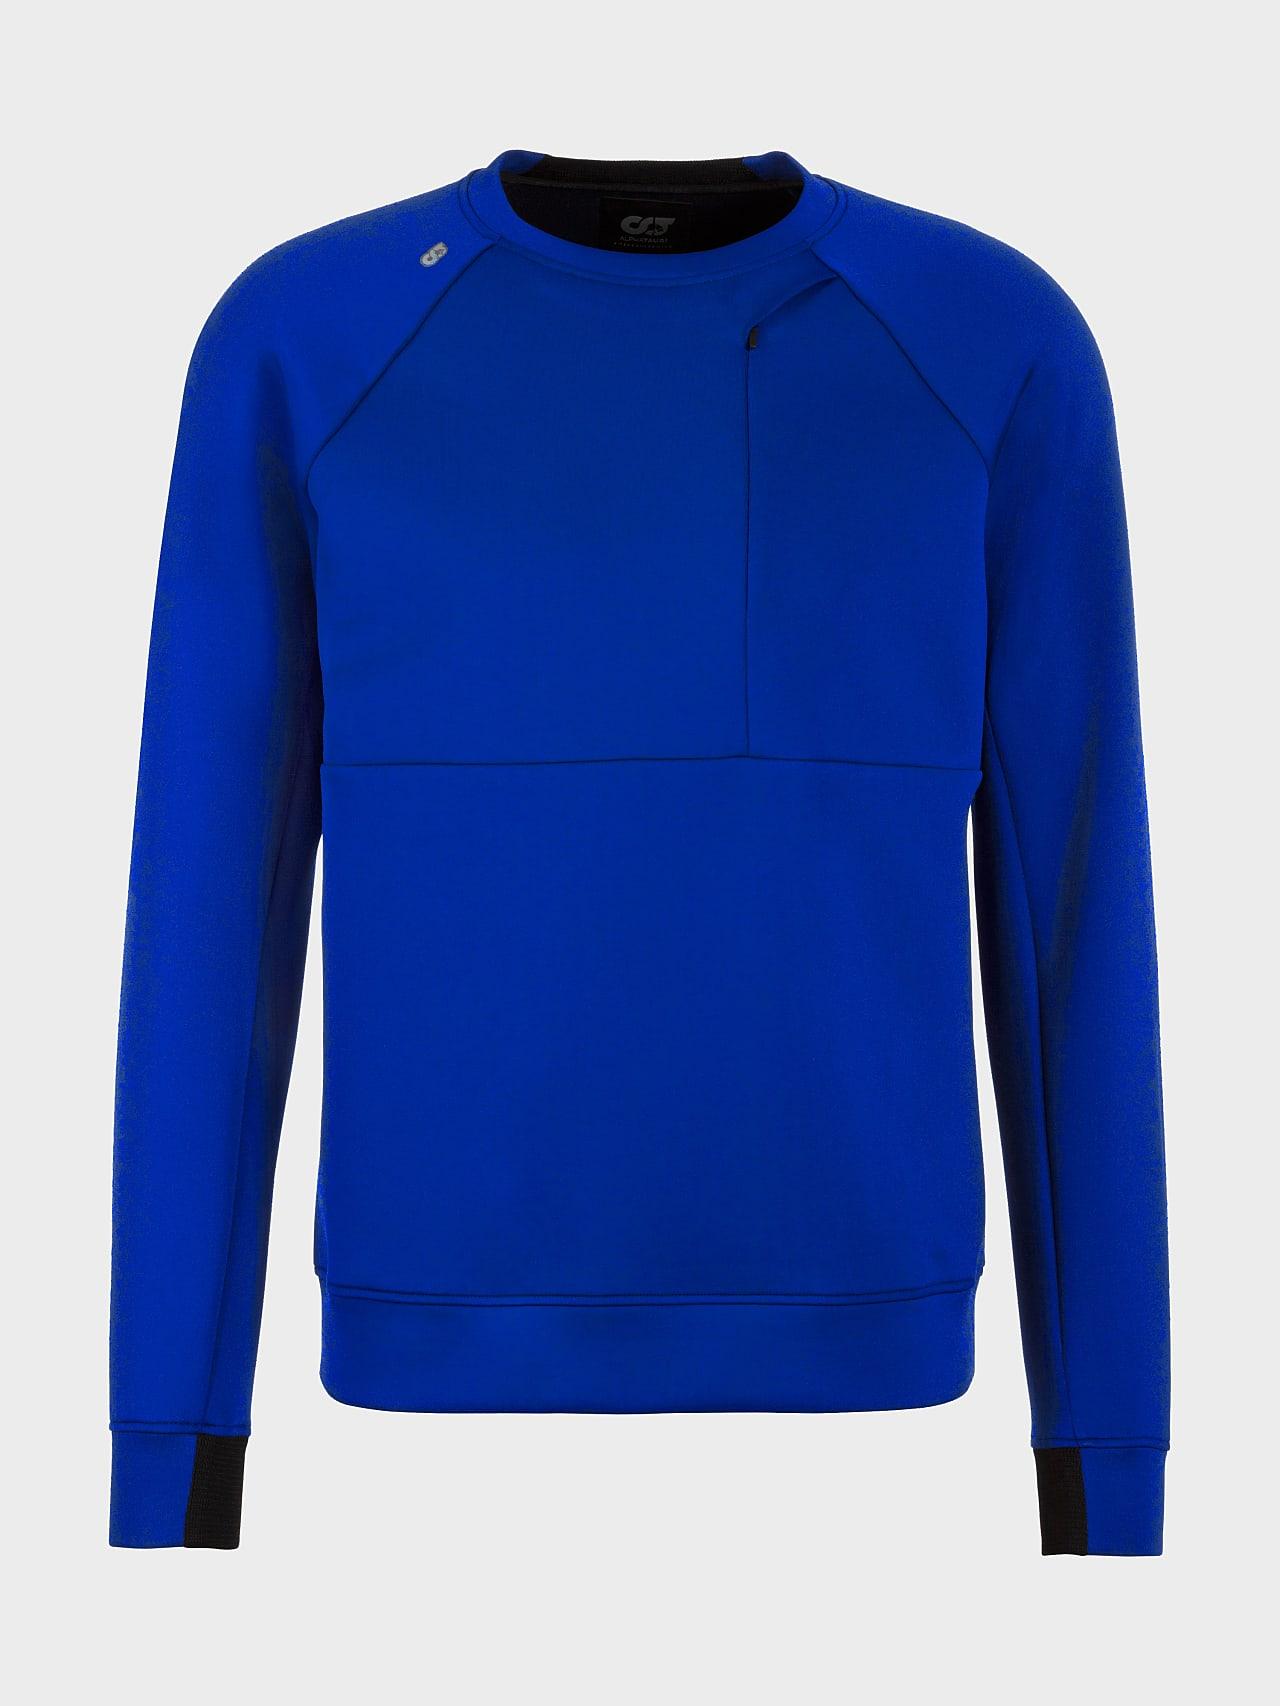 SUPRA V3.Y5.01 Technical Crewneck Sweater blue Back Alpha Tauri